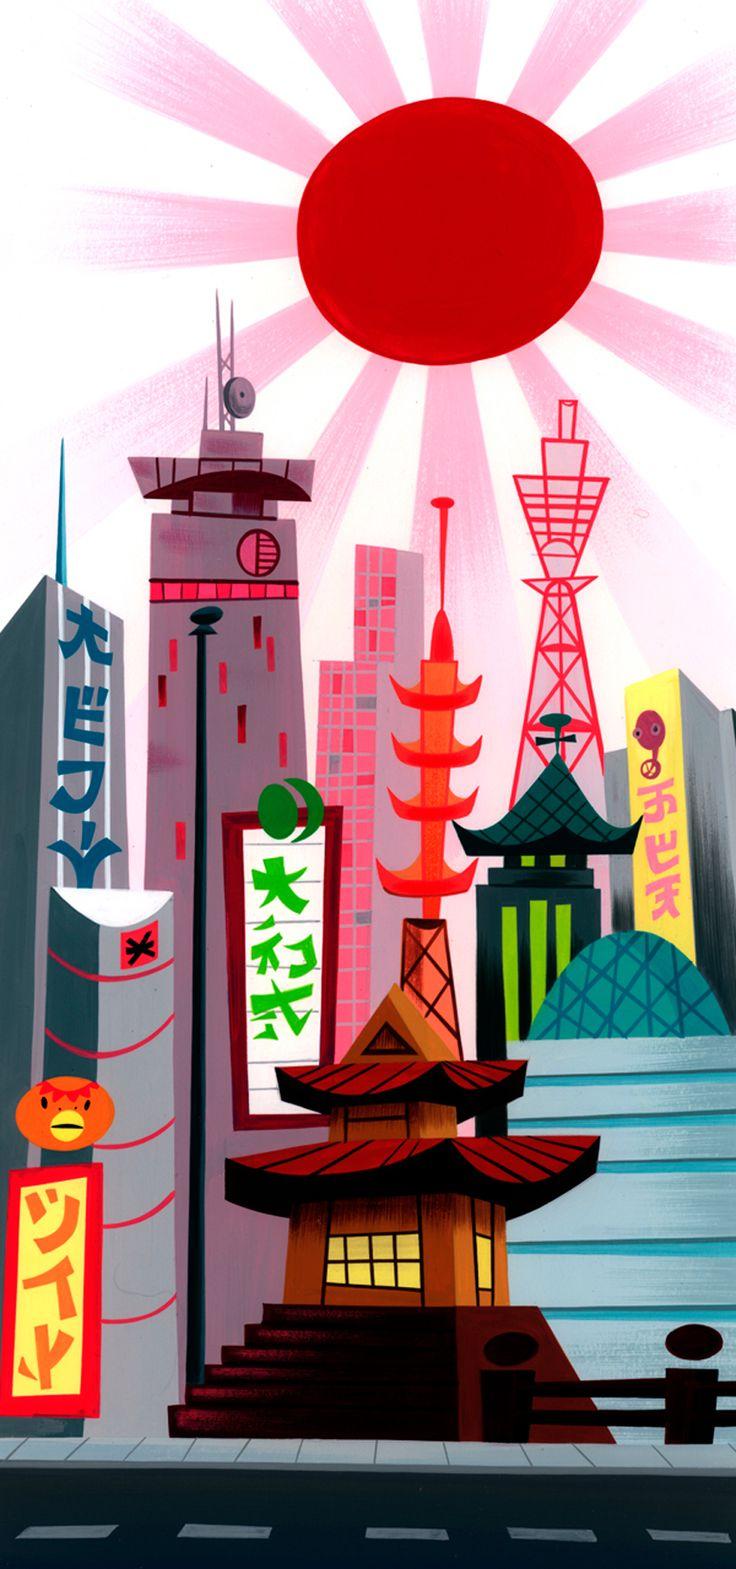 The Art Of Animation, carol Wyatt